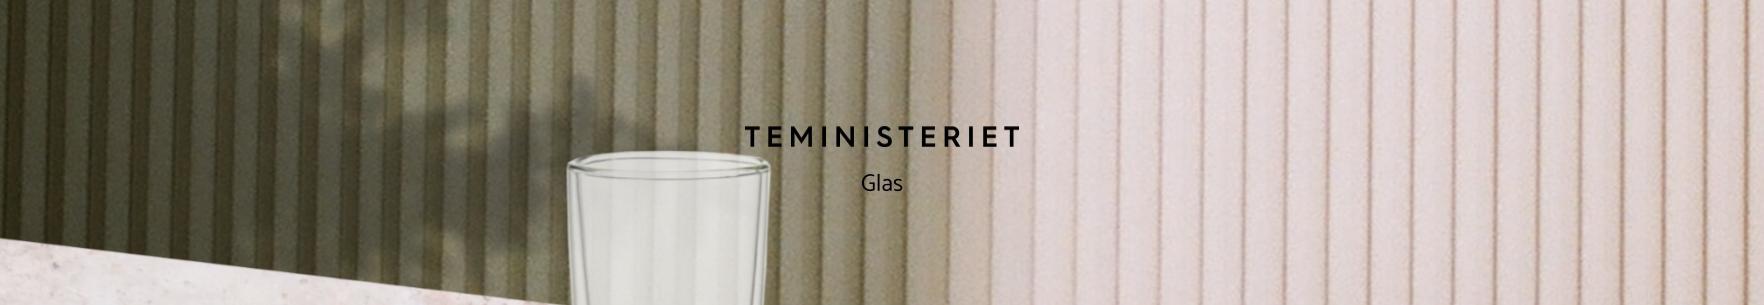 Glas Teministeriet